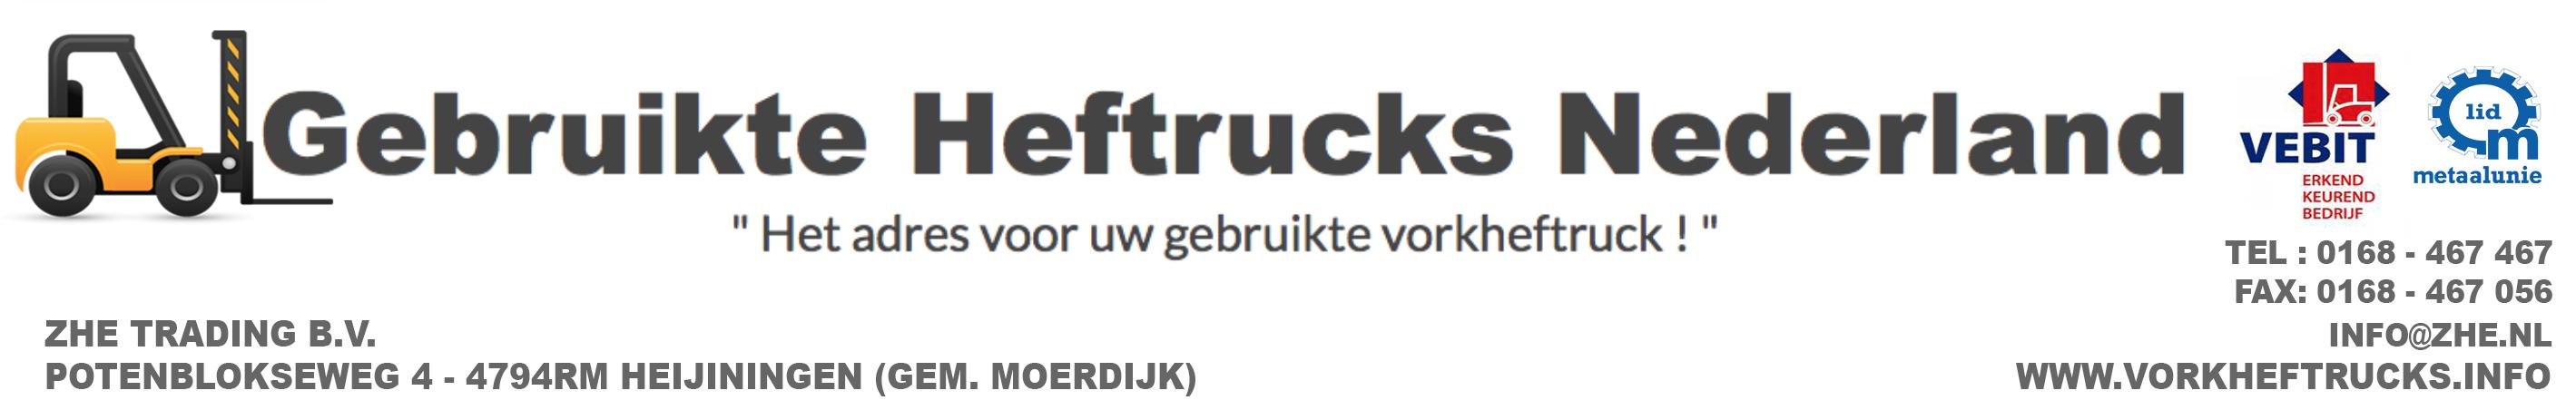 Gebruikte Heftrucks Nederland